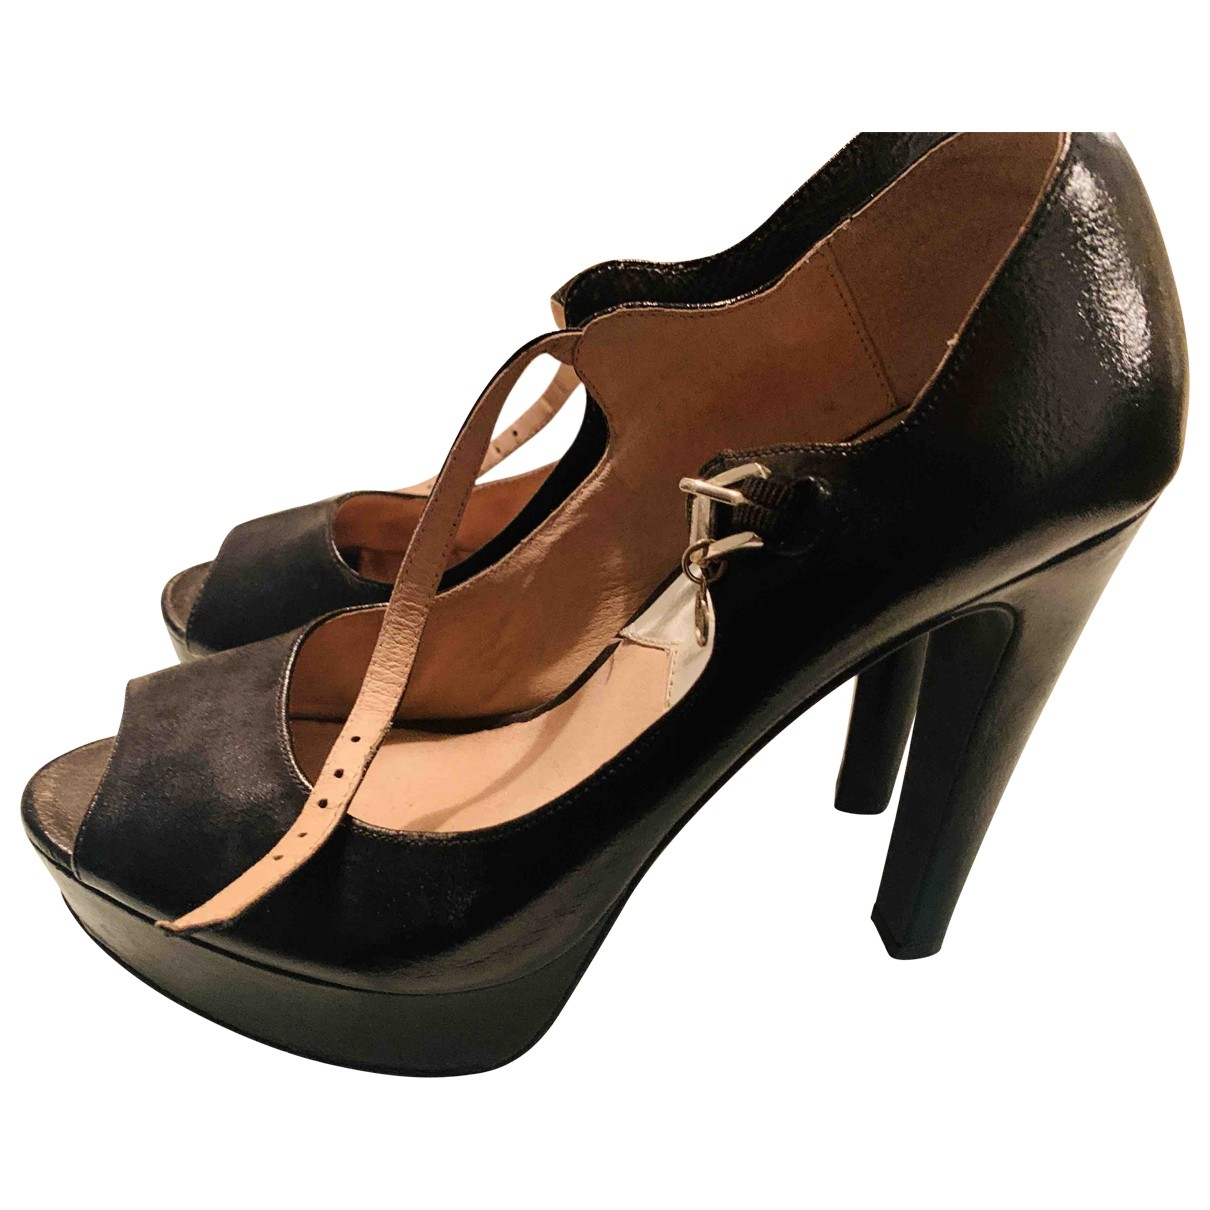 Michael Kors \N Black Leather Heels for Women 9 US